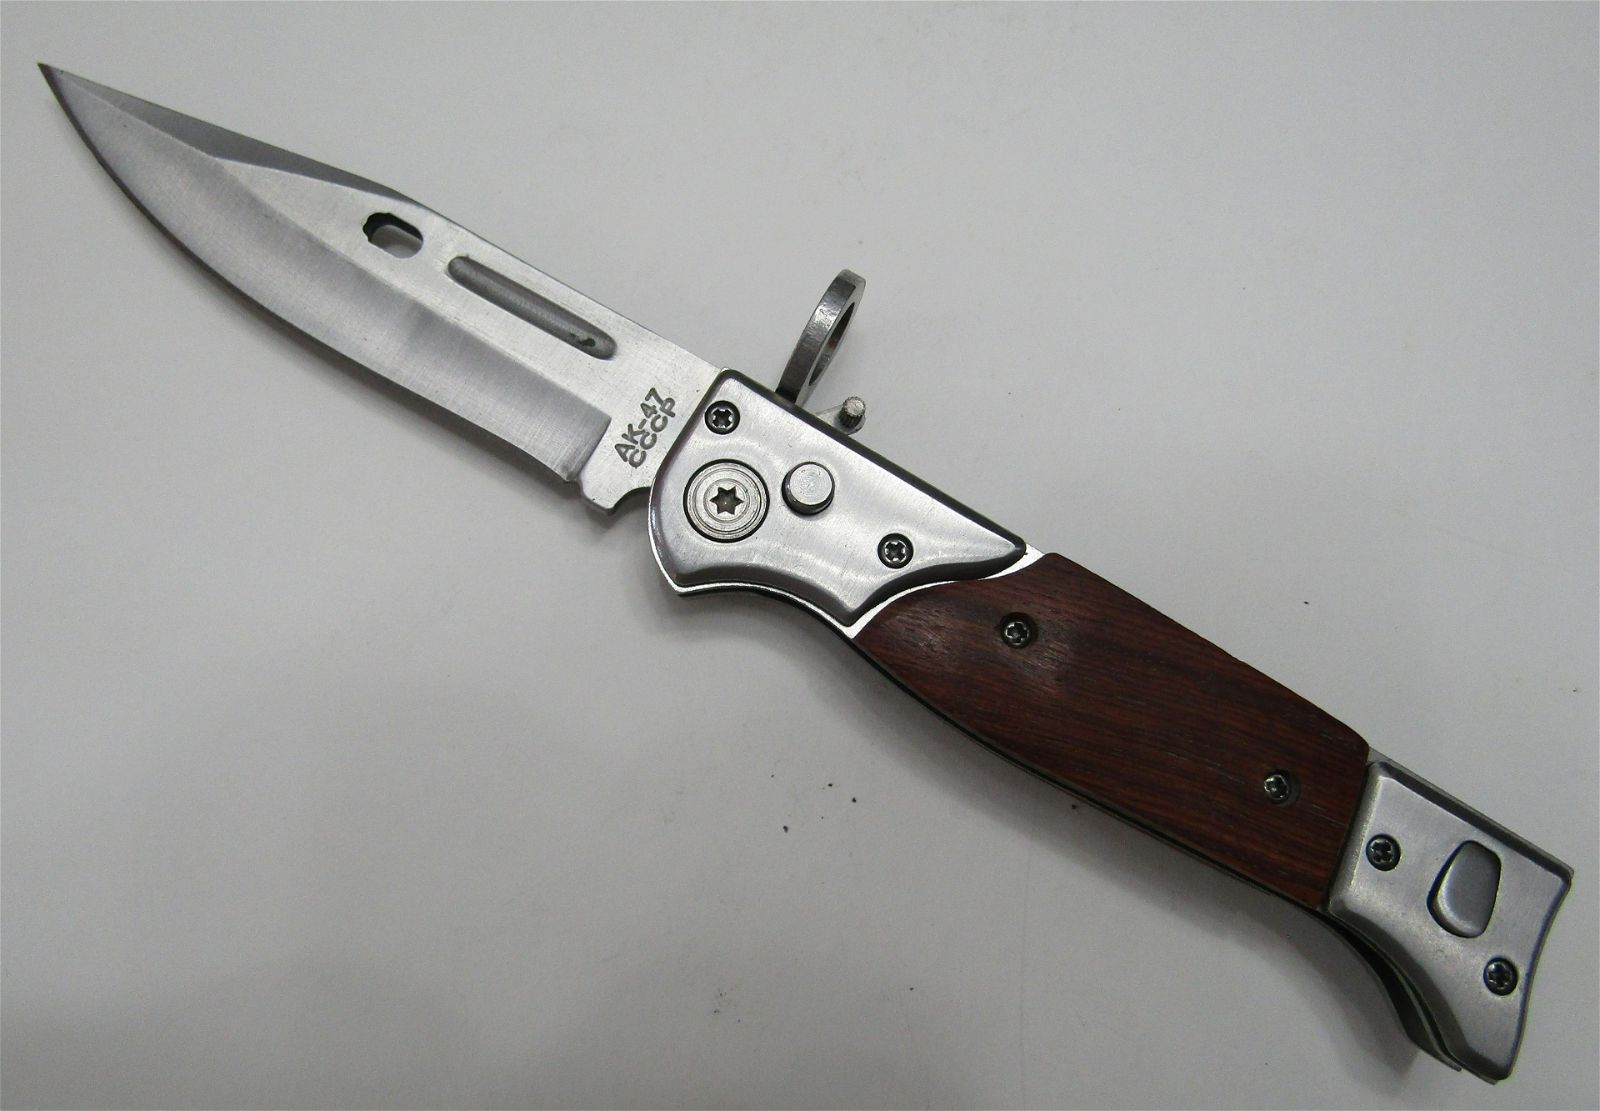 AK47 SWITCHBLADE BAYONET KNIFE